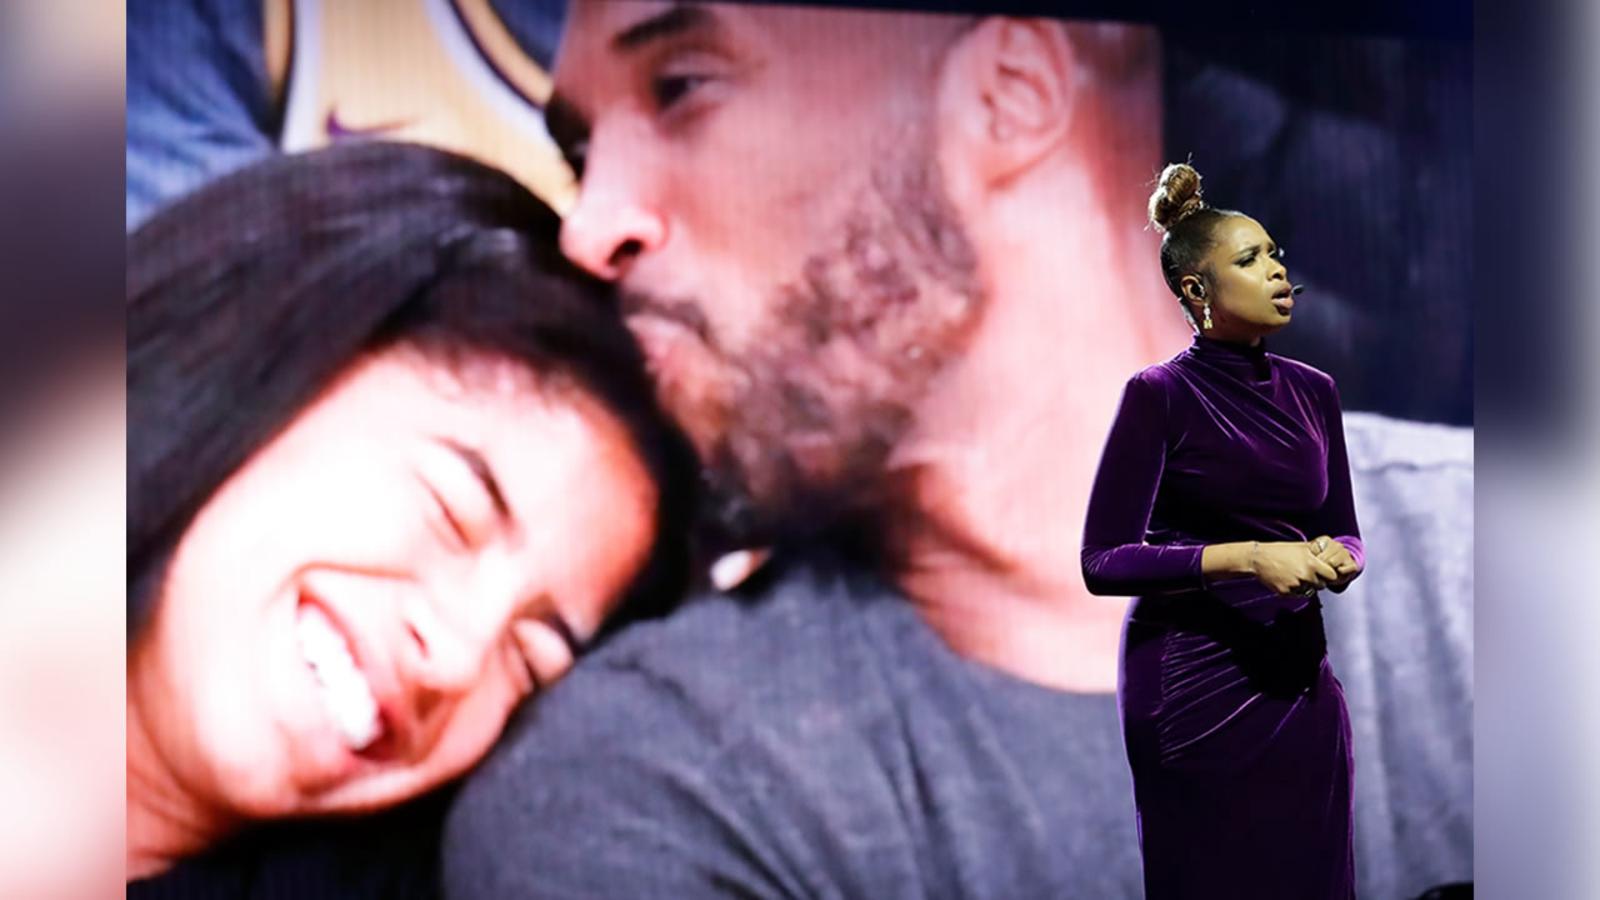 Magic Johnson, Jennifer Hudson lead tribute for Kobe Bryant ahead of All-Star Game in Chicago